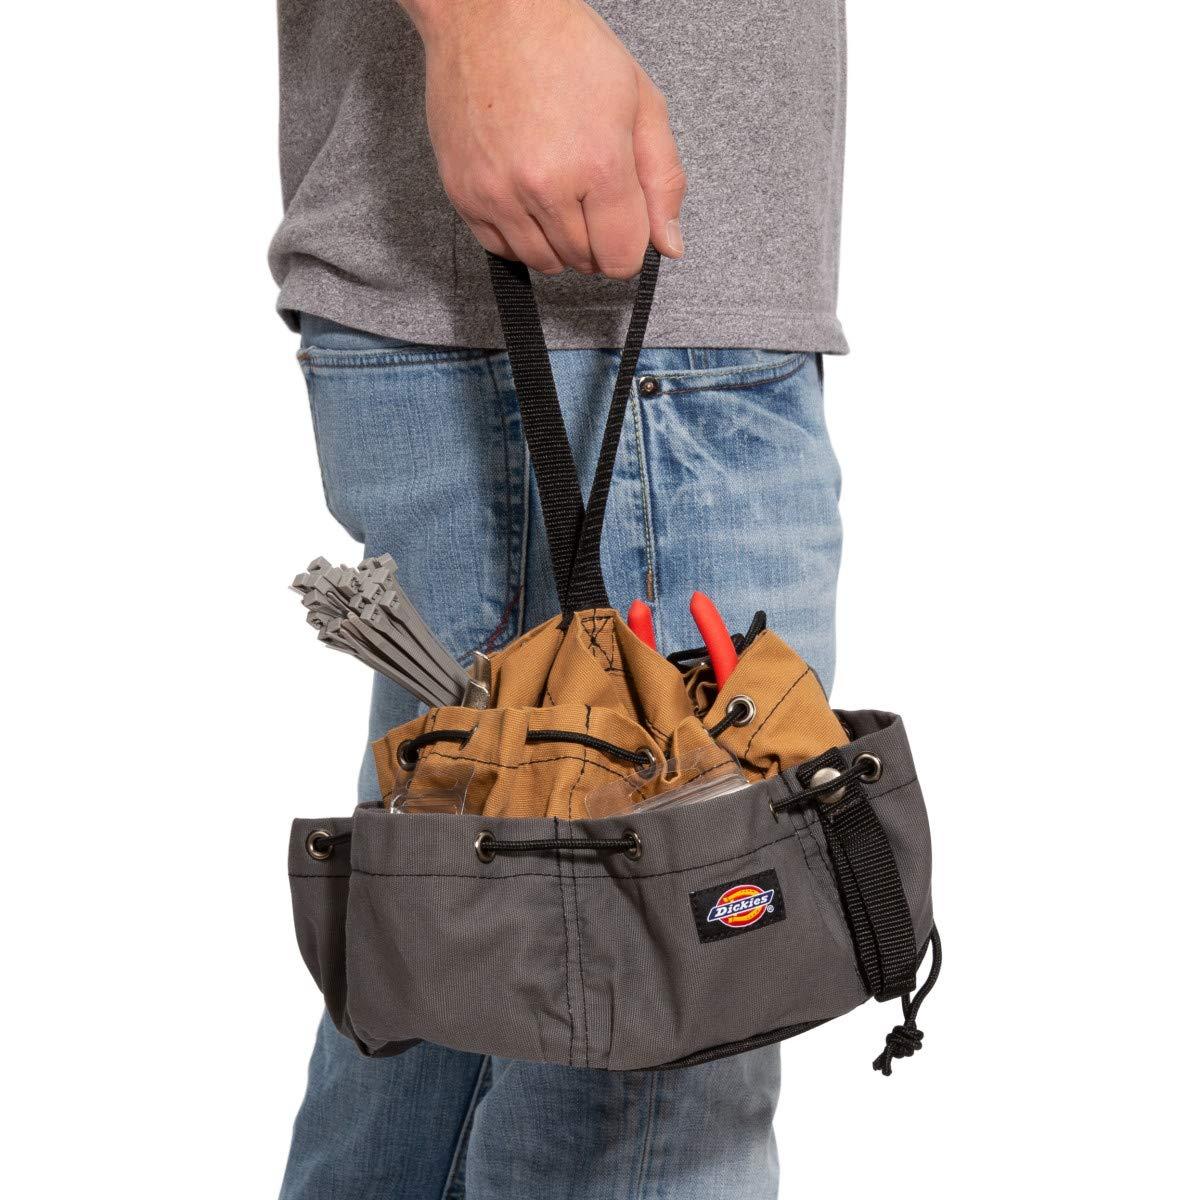 Dickies Work Gear – 12-Pocket Parachute Style Bag – 57004 – Grey/Tan Parachute Work Bag – Tool Bag – Construction – Snap-Secured Tape Strap – 8.8 oz. by Dickies Work Gear (Image #5)